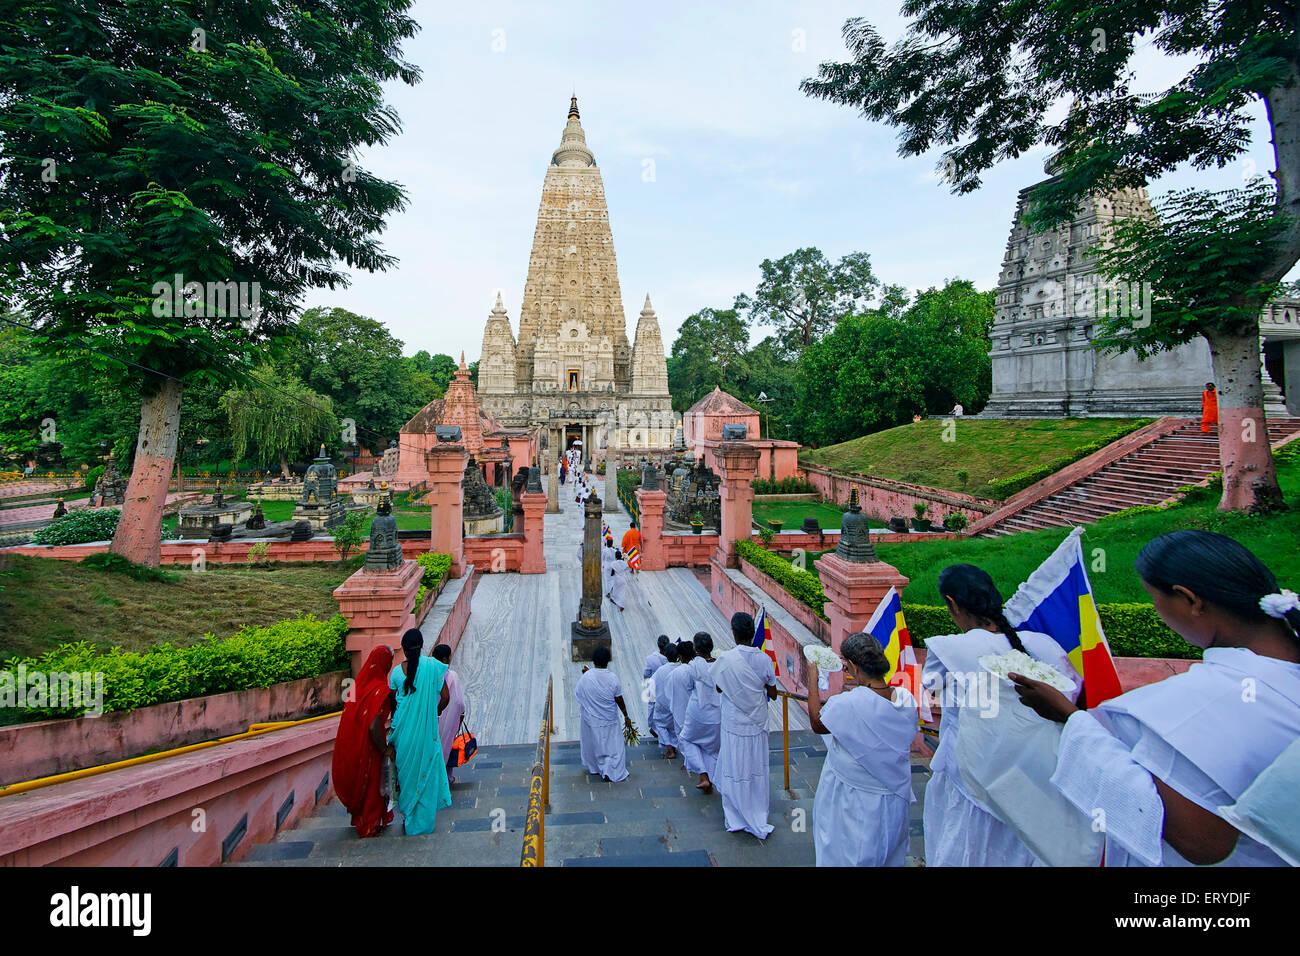 Pilgrims of Sri Lankan at rituals ; UNESCO World Heritage site Mahabodhi temple ; Bodhgaya ; Bihar ; India - Stock Image